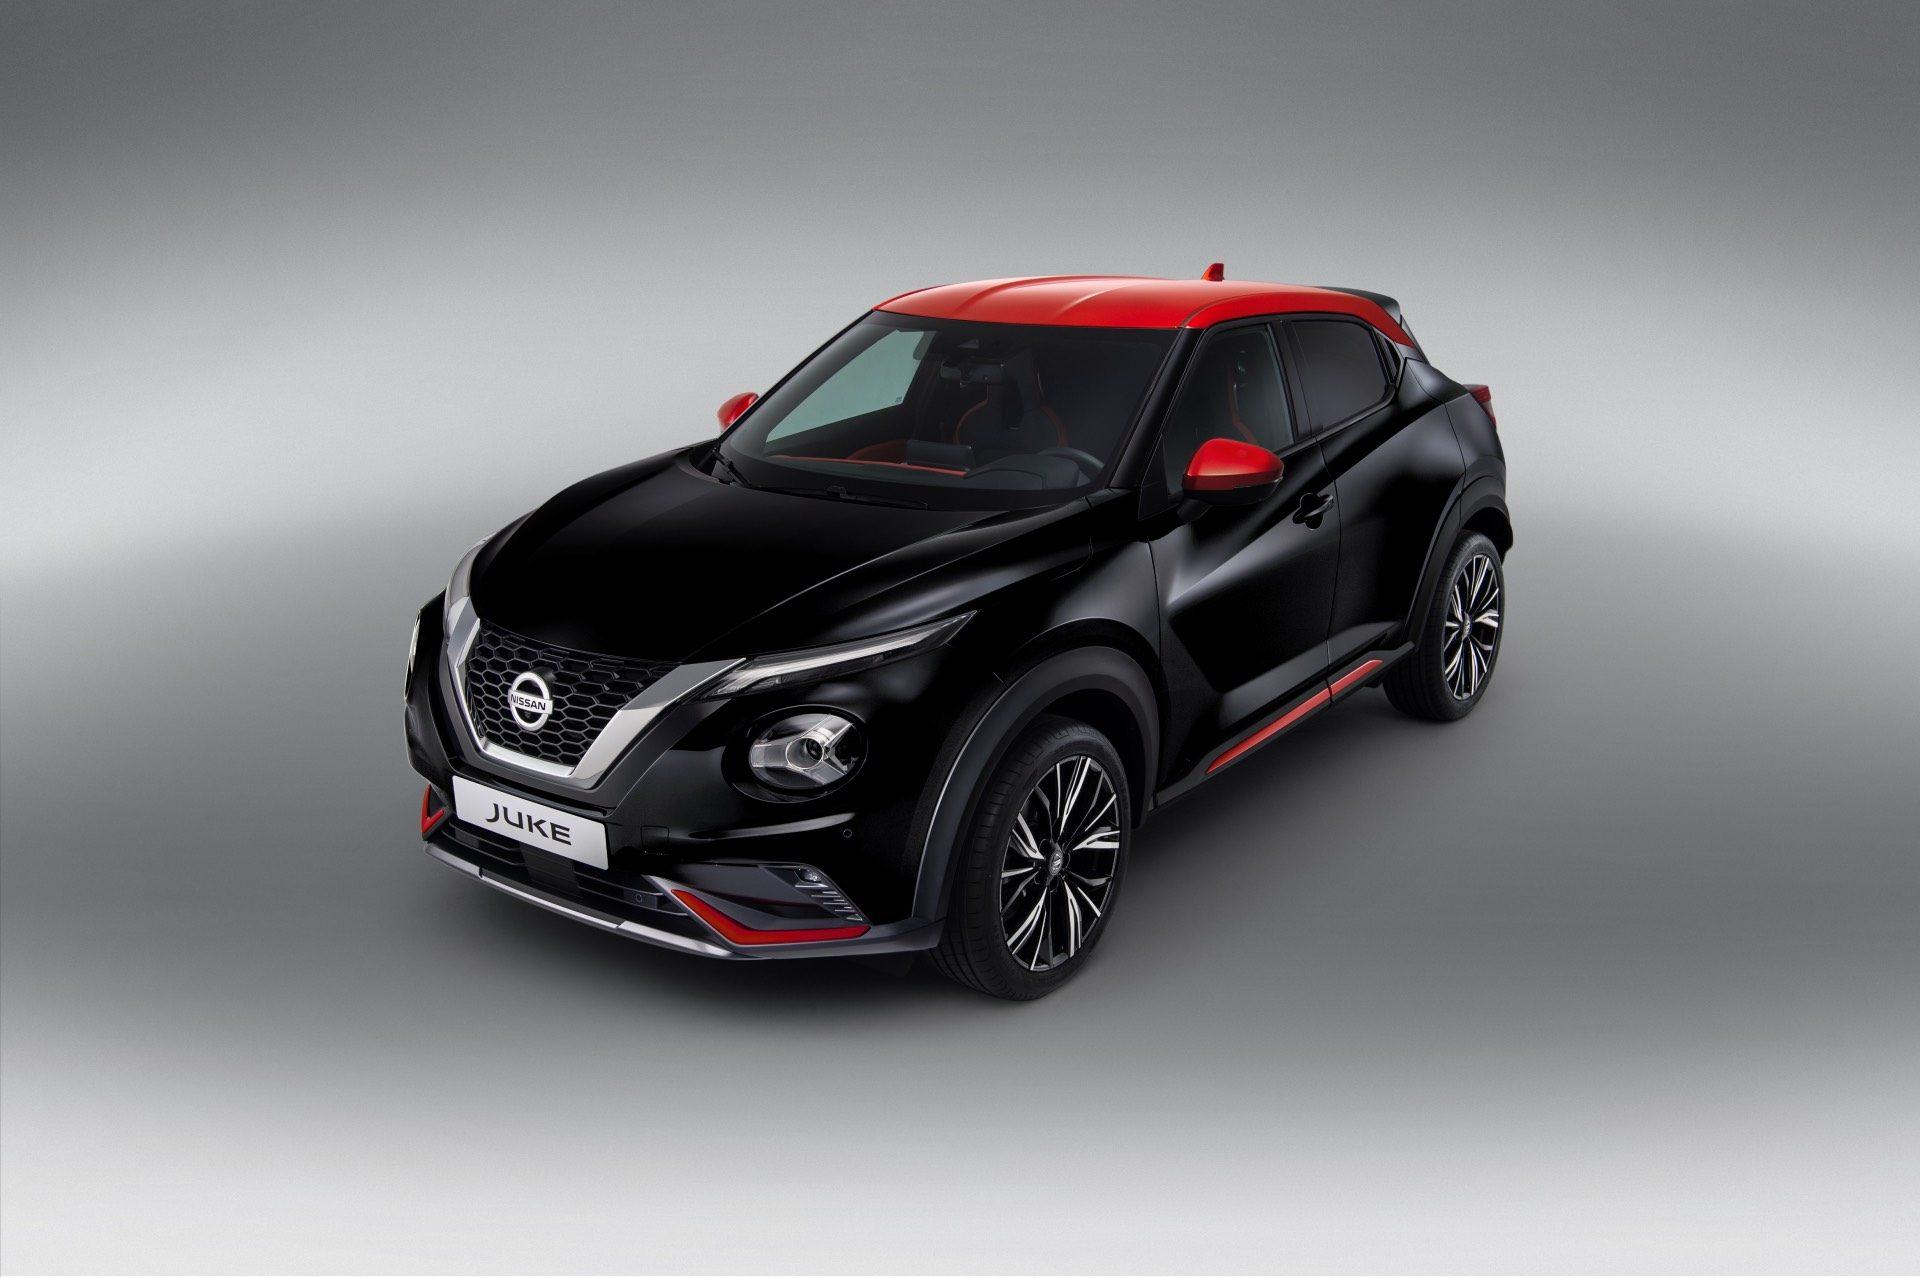 Nissan Juke 2019 bi color